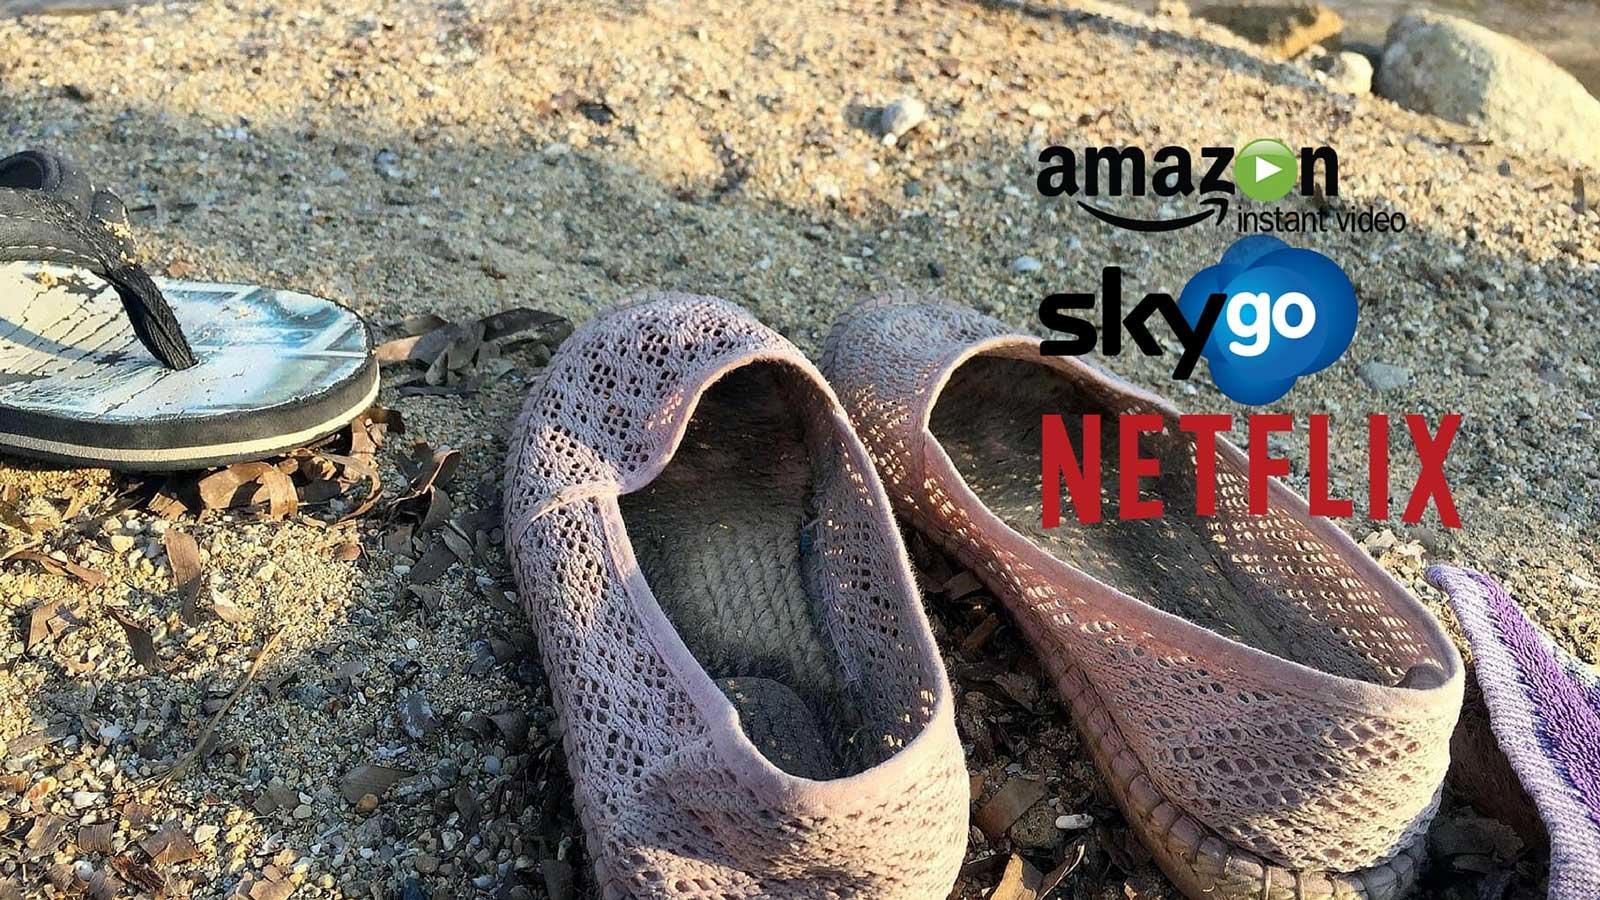 UnoTelly: SkyGo, Amazon Prime & Netflix im Ausland – so geht's! 10 techboys.de • smarte News, auf den Punkt! UnoTelly: SkyGo, Amazon Prime & Netflix im Ausland – so geht's!